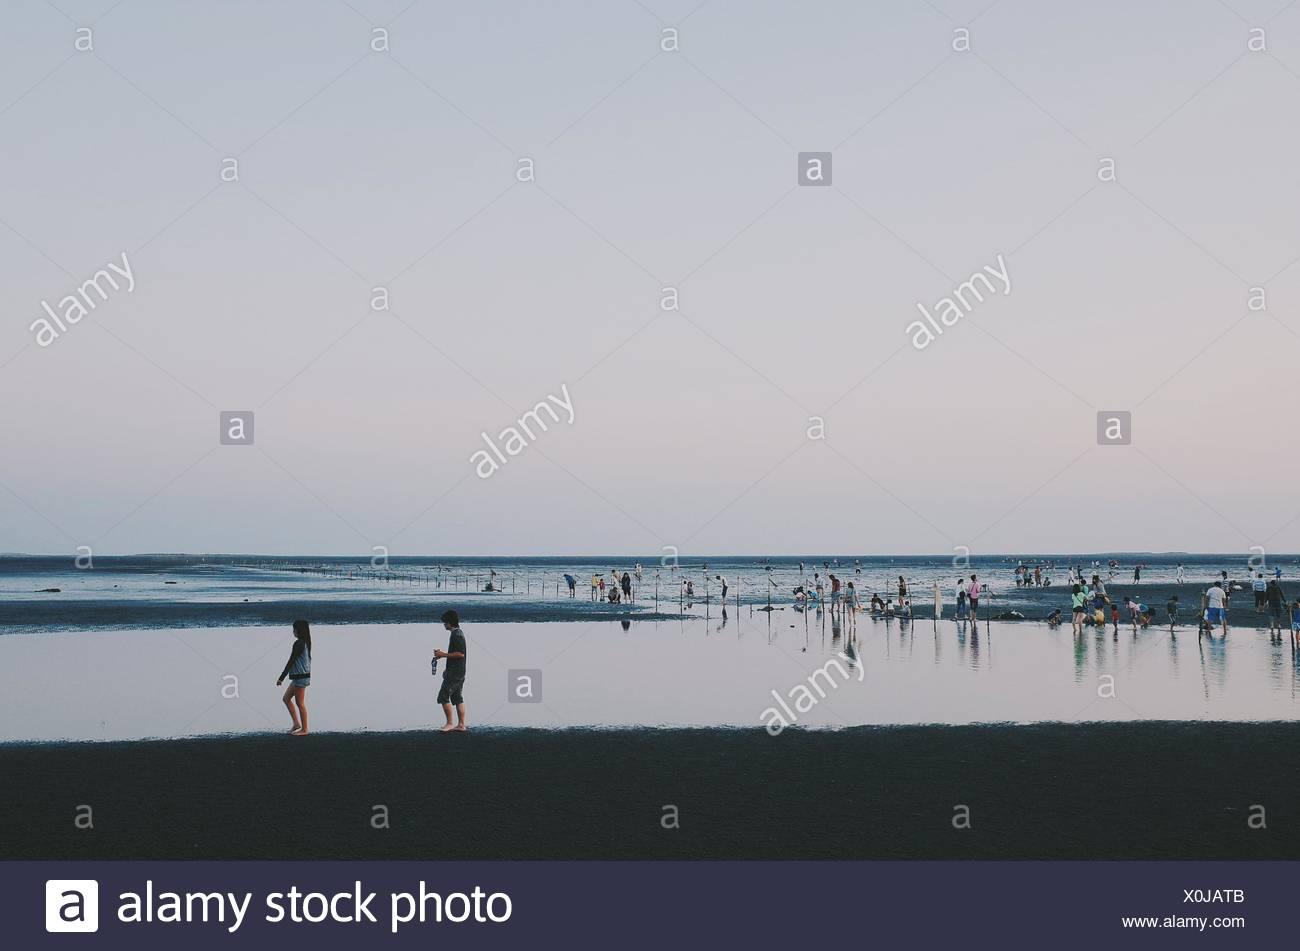 Beach At Twilight - Stock Image